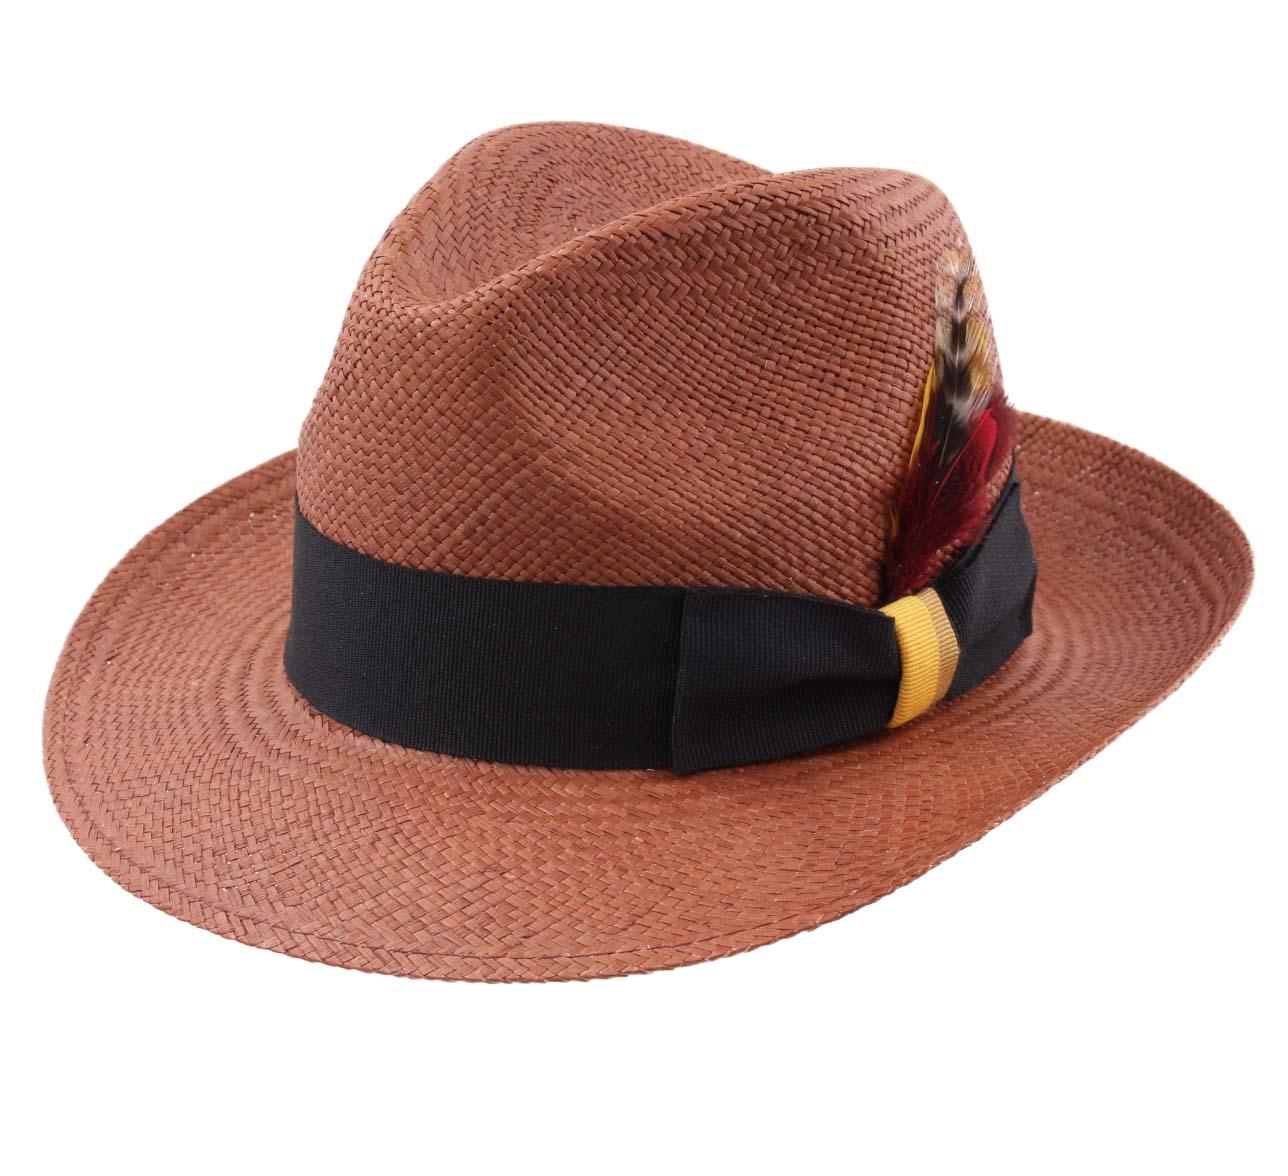 Escapade - Sombrero Classic Italy 893e1dbe2728